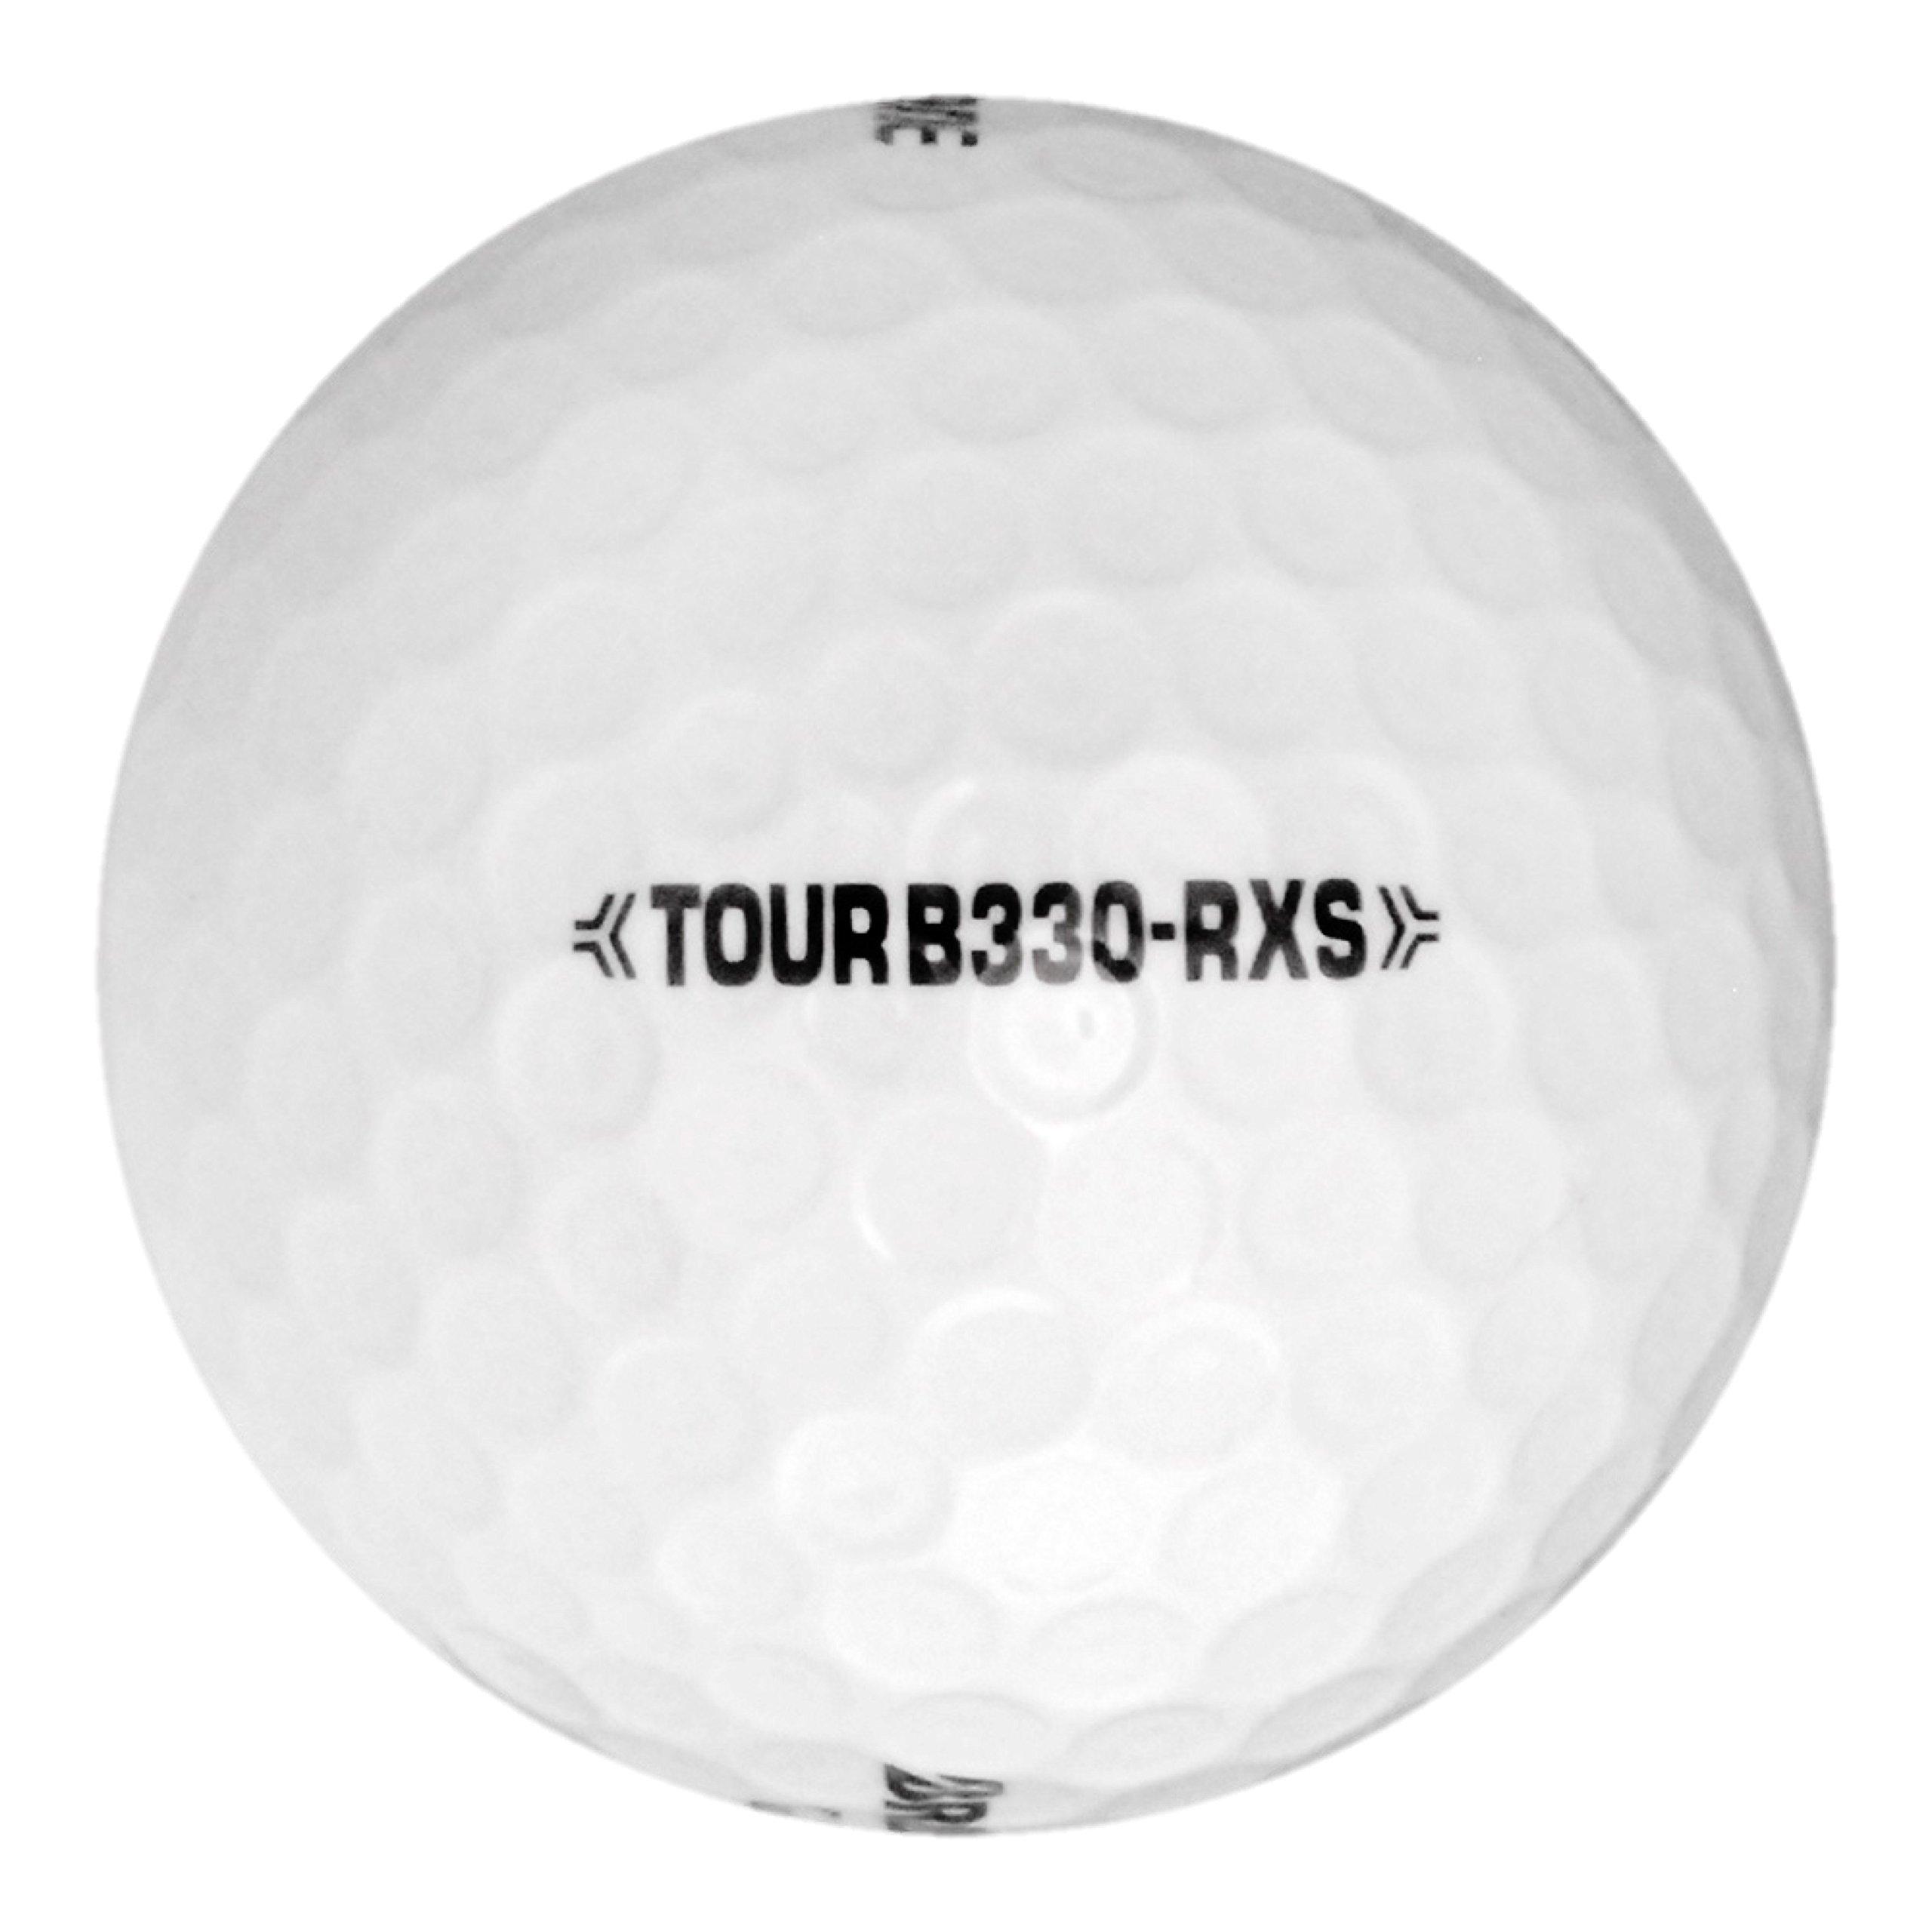 120 Bridgestone Tour B330-RXS - Near Mint (AAAA) Grade - Recycled (Used) Golf Balls